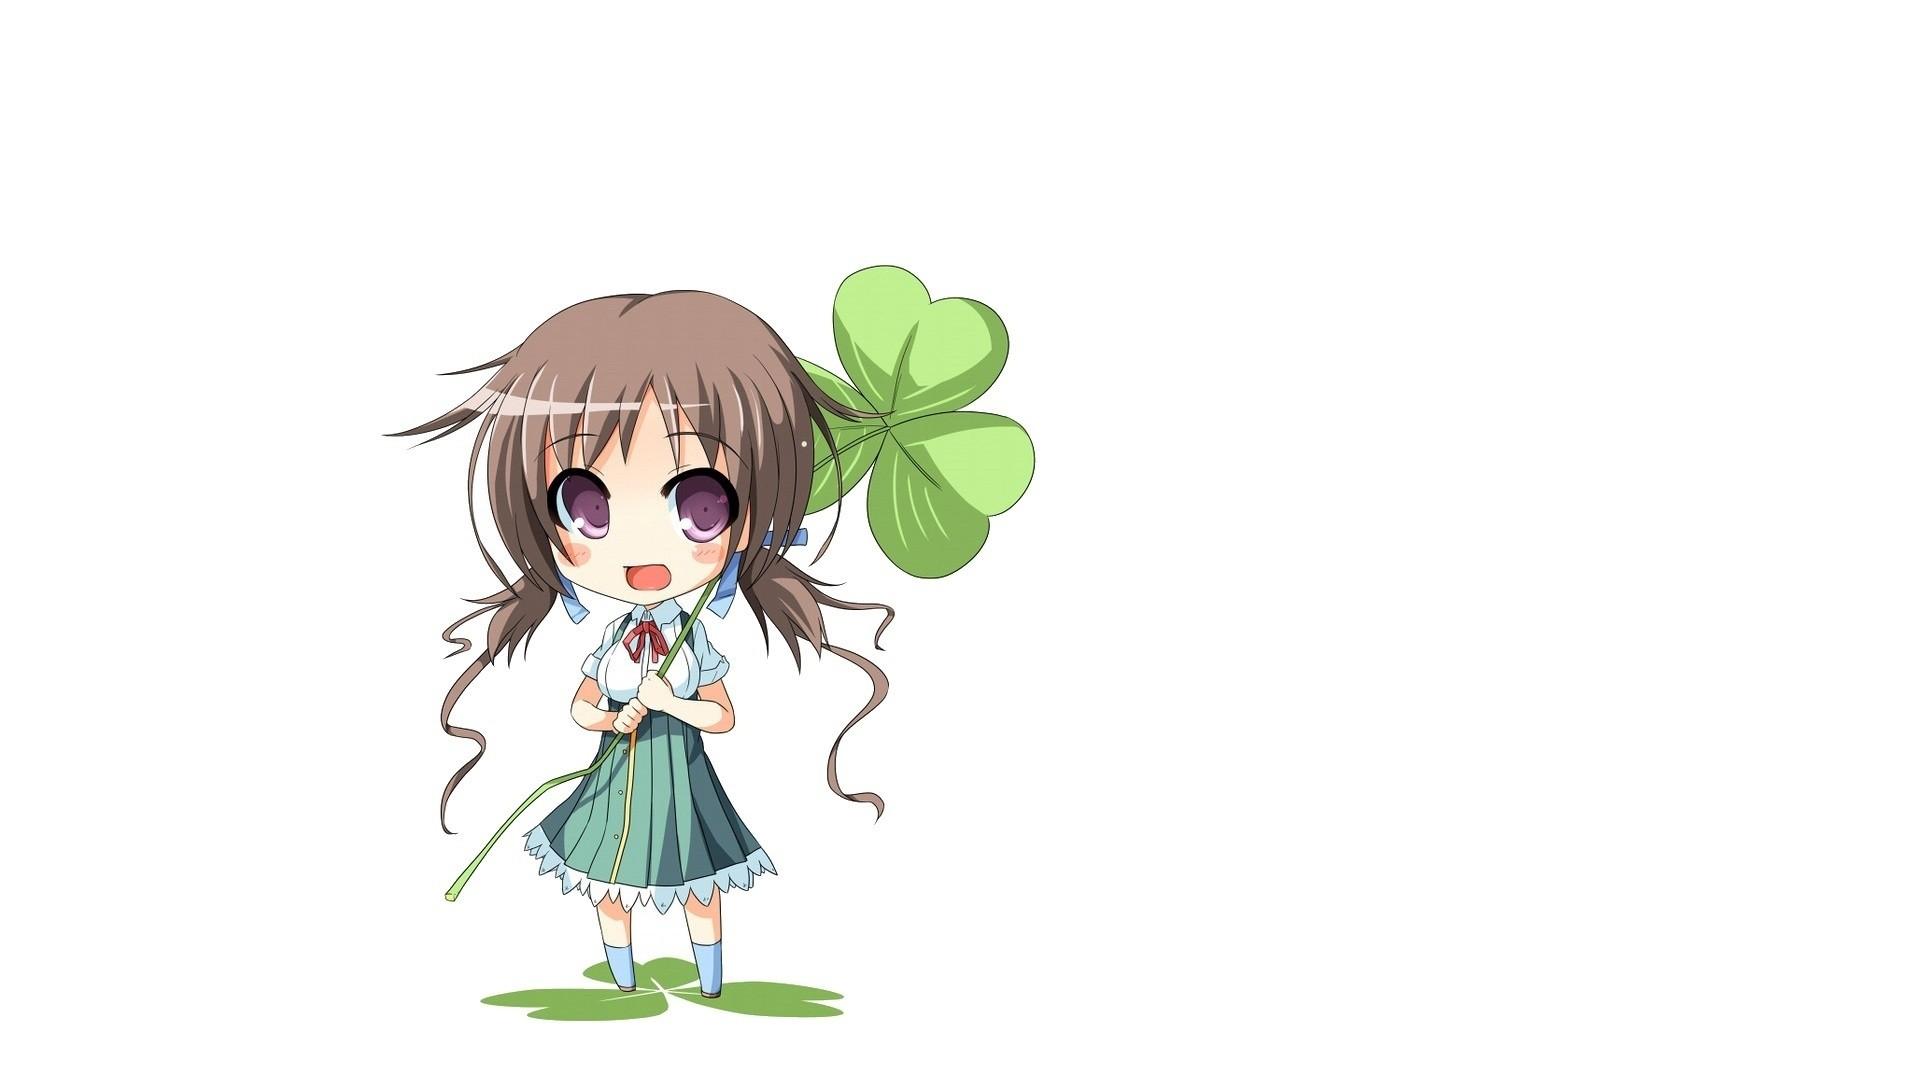 Chibi Anime Girl Background Wallpaper